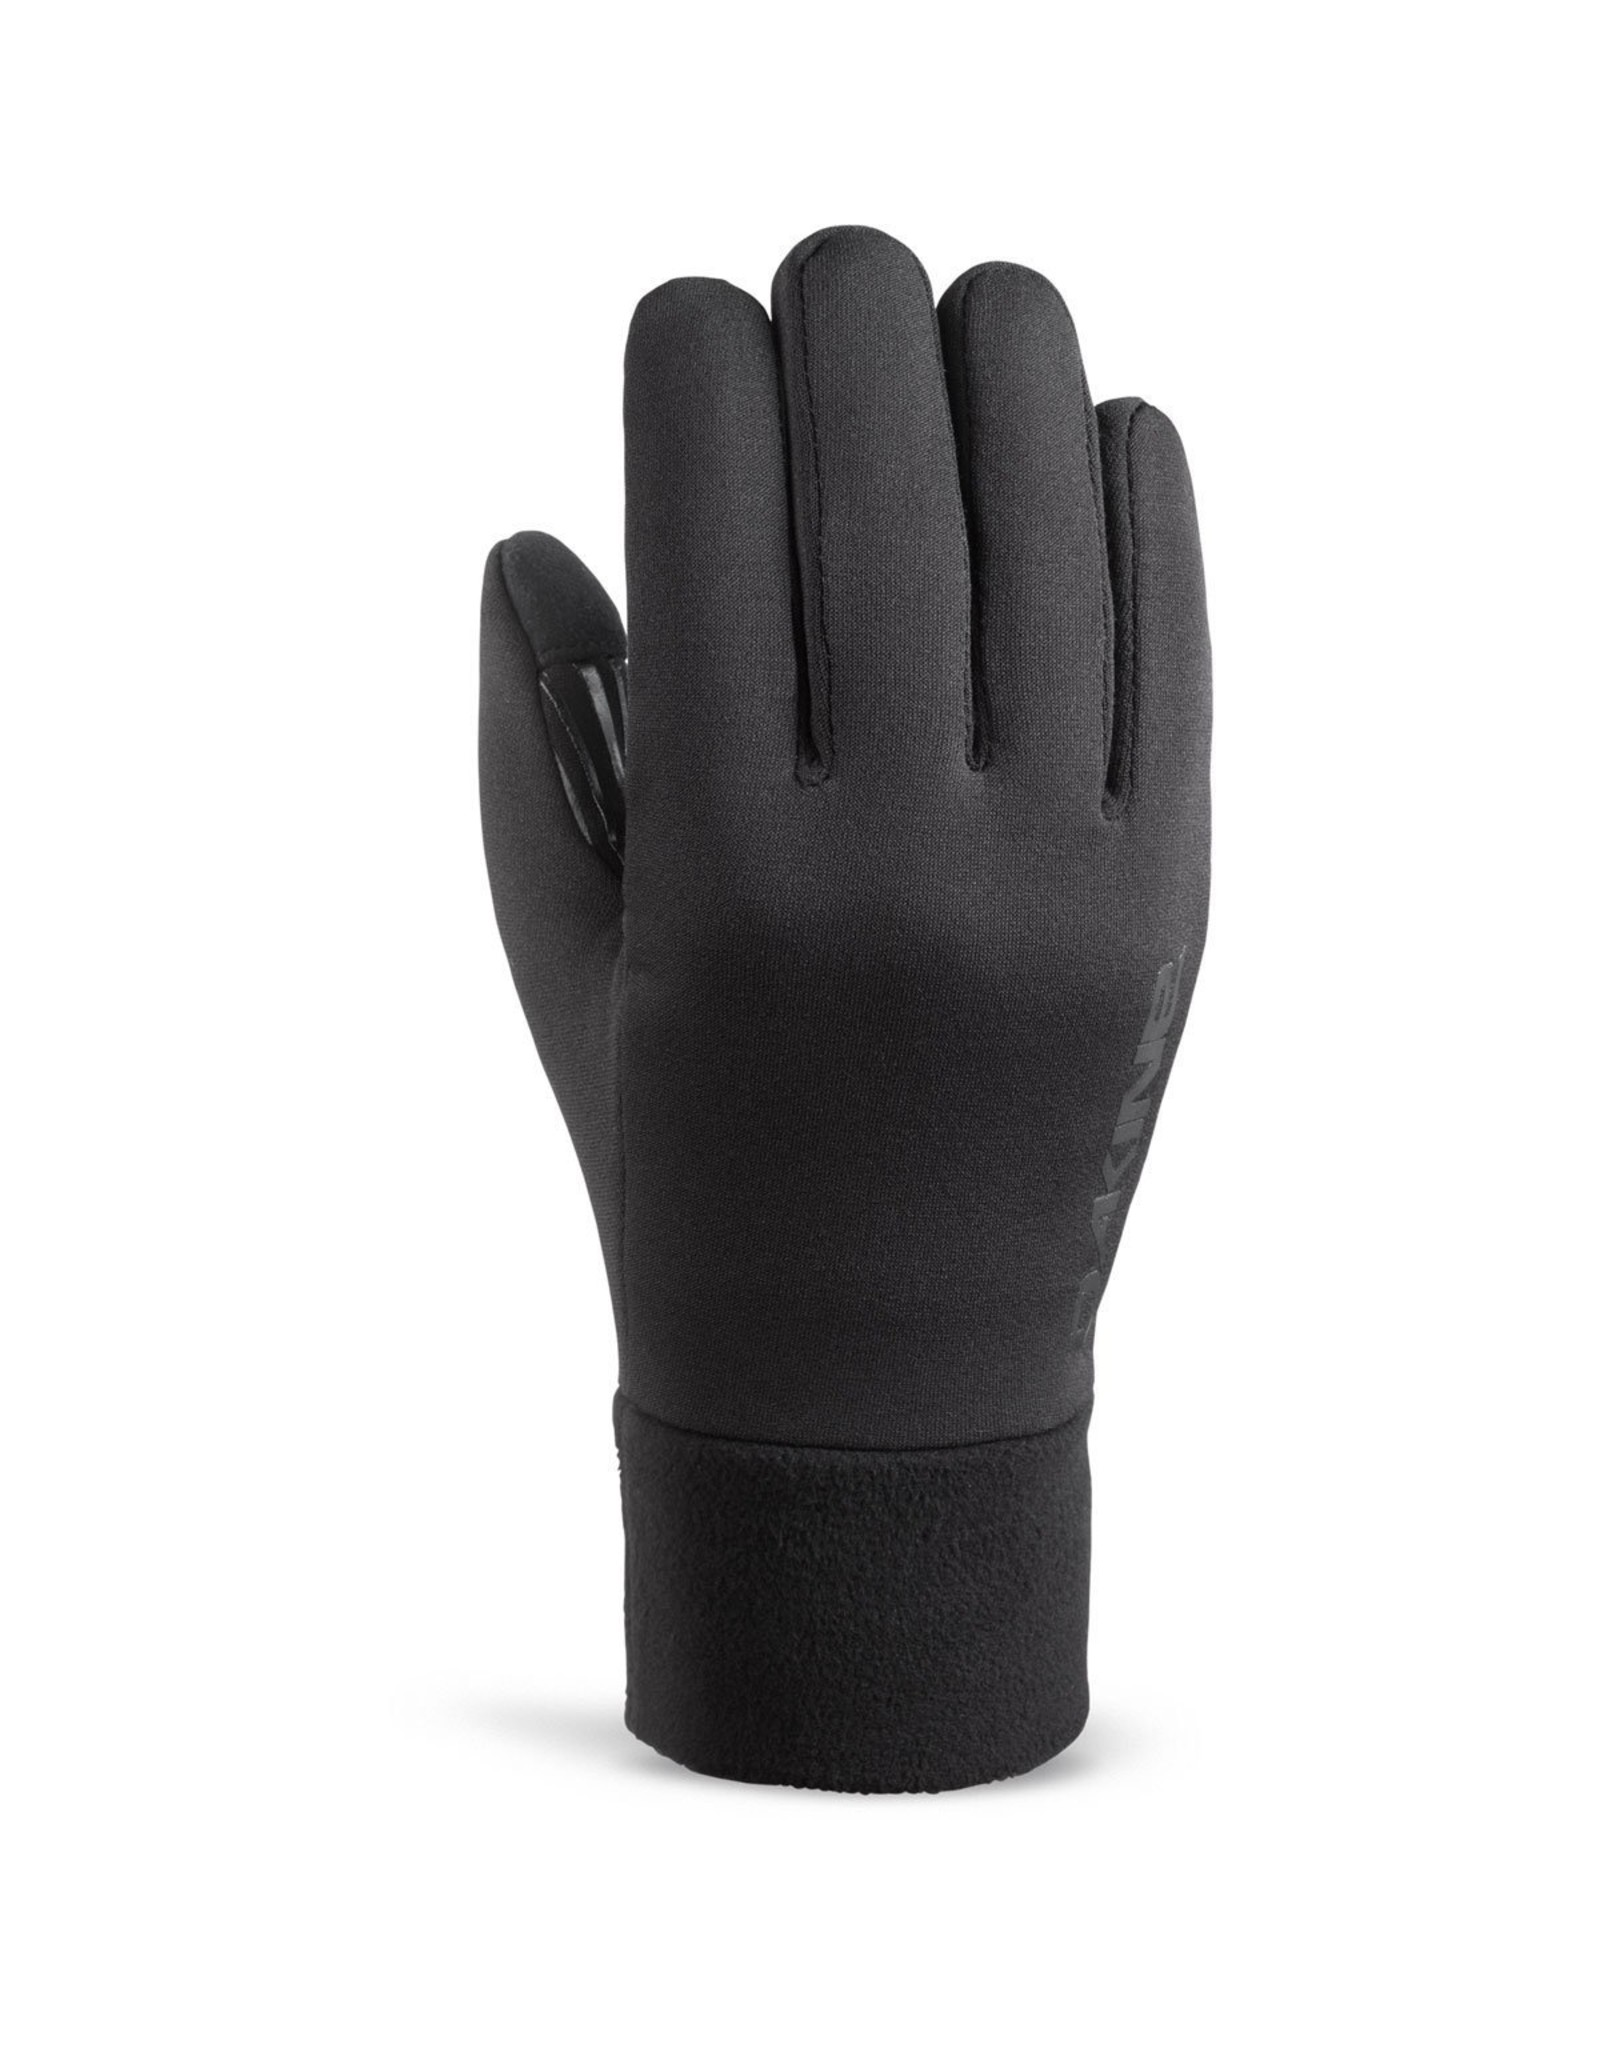 Dakine Dakine Storm Liner Glove